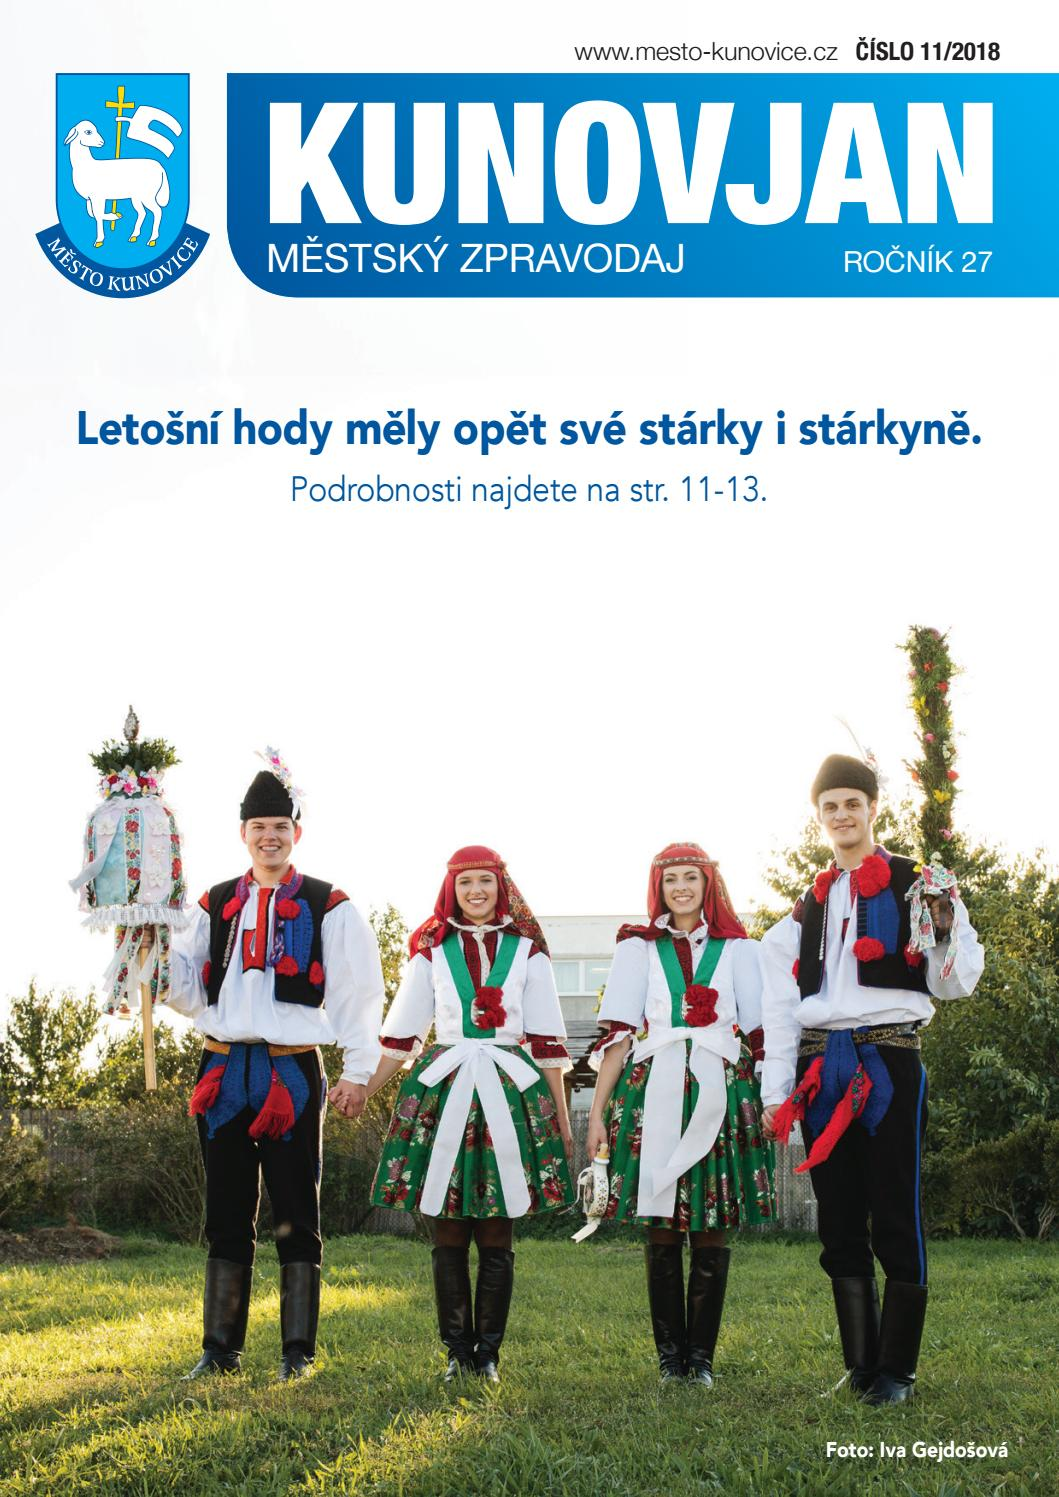 Dobr den,na naten velkofilmu Ztopek - Cinema Casting